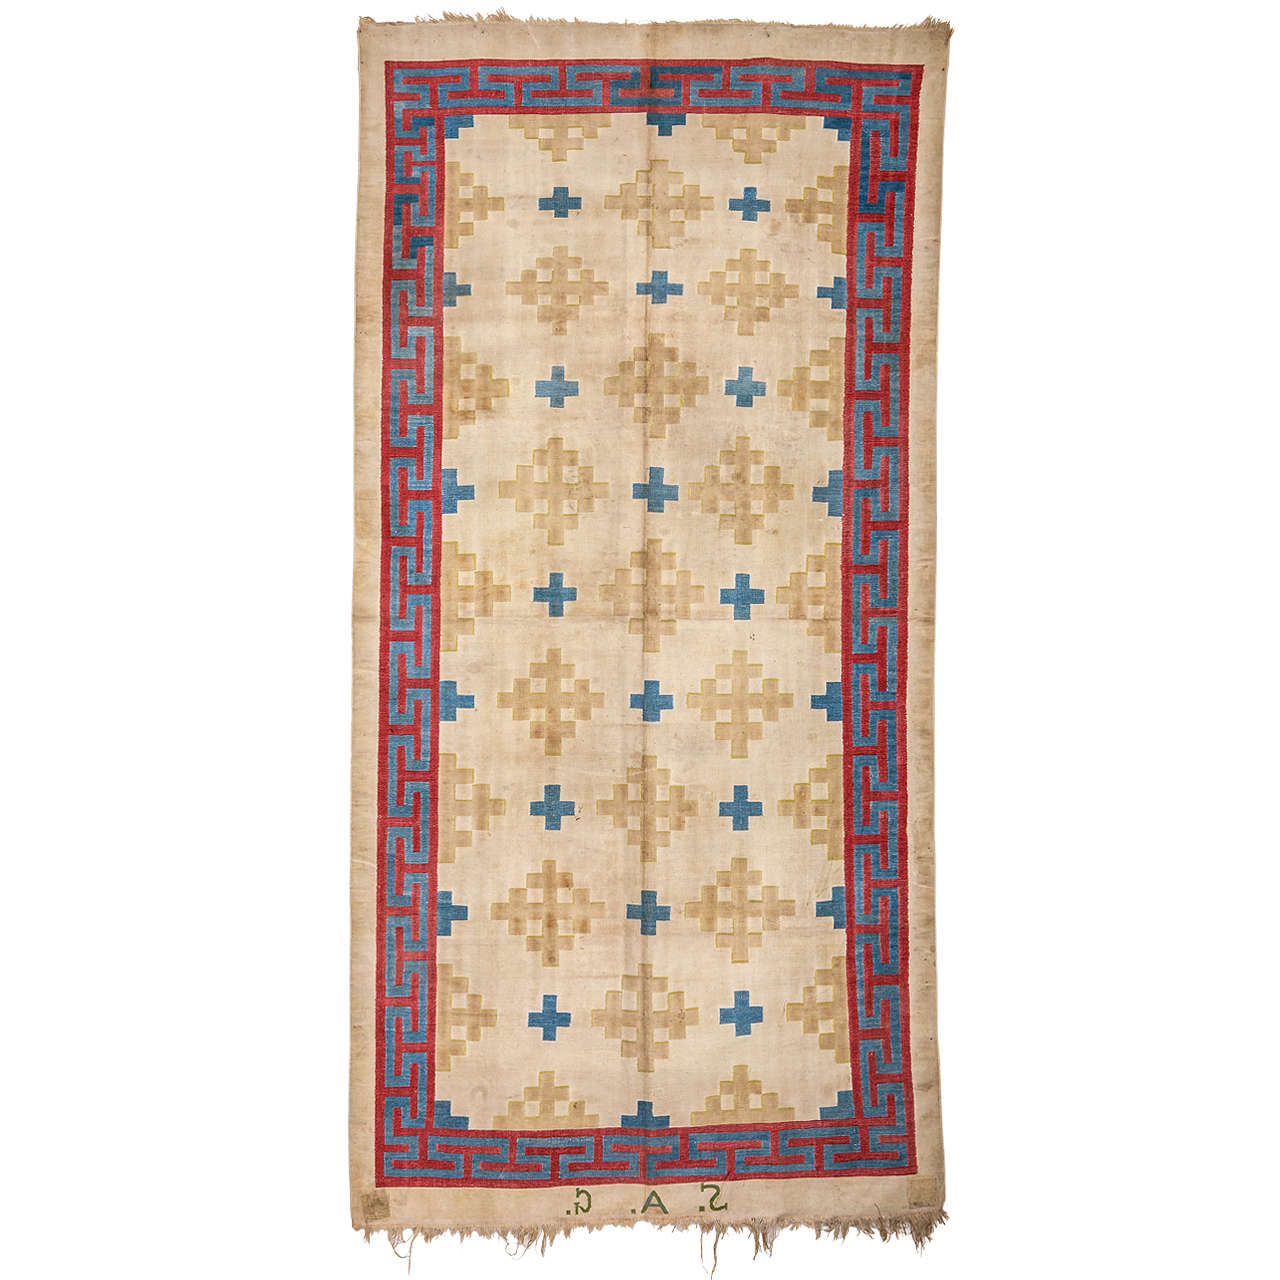 Antique Cotton Dhurrie Rug